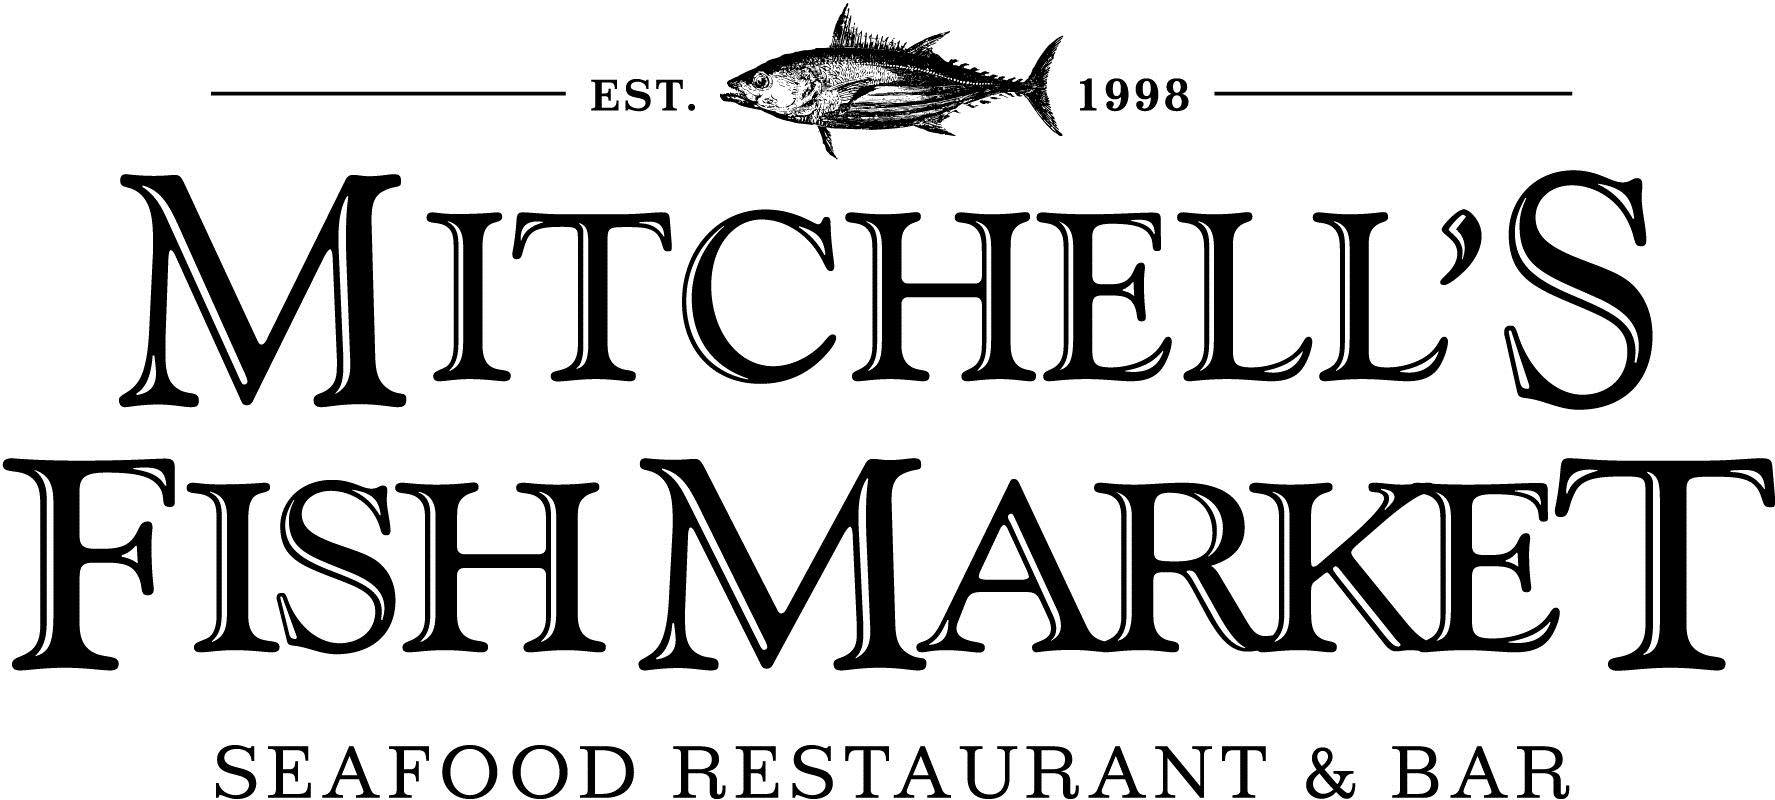 Mitchell s fish market presents italy uncorked wine dinner for Mitchell fish market menu